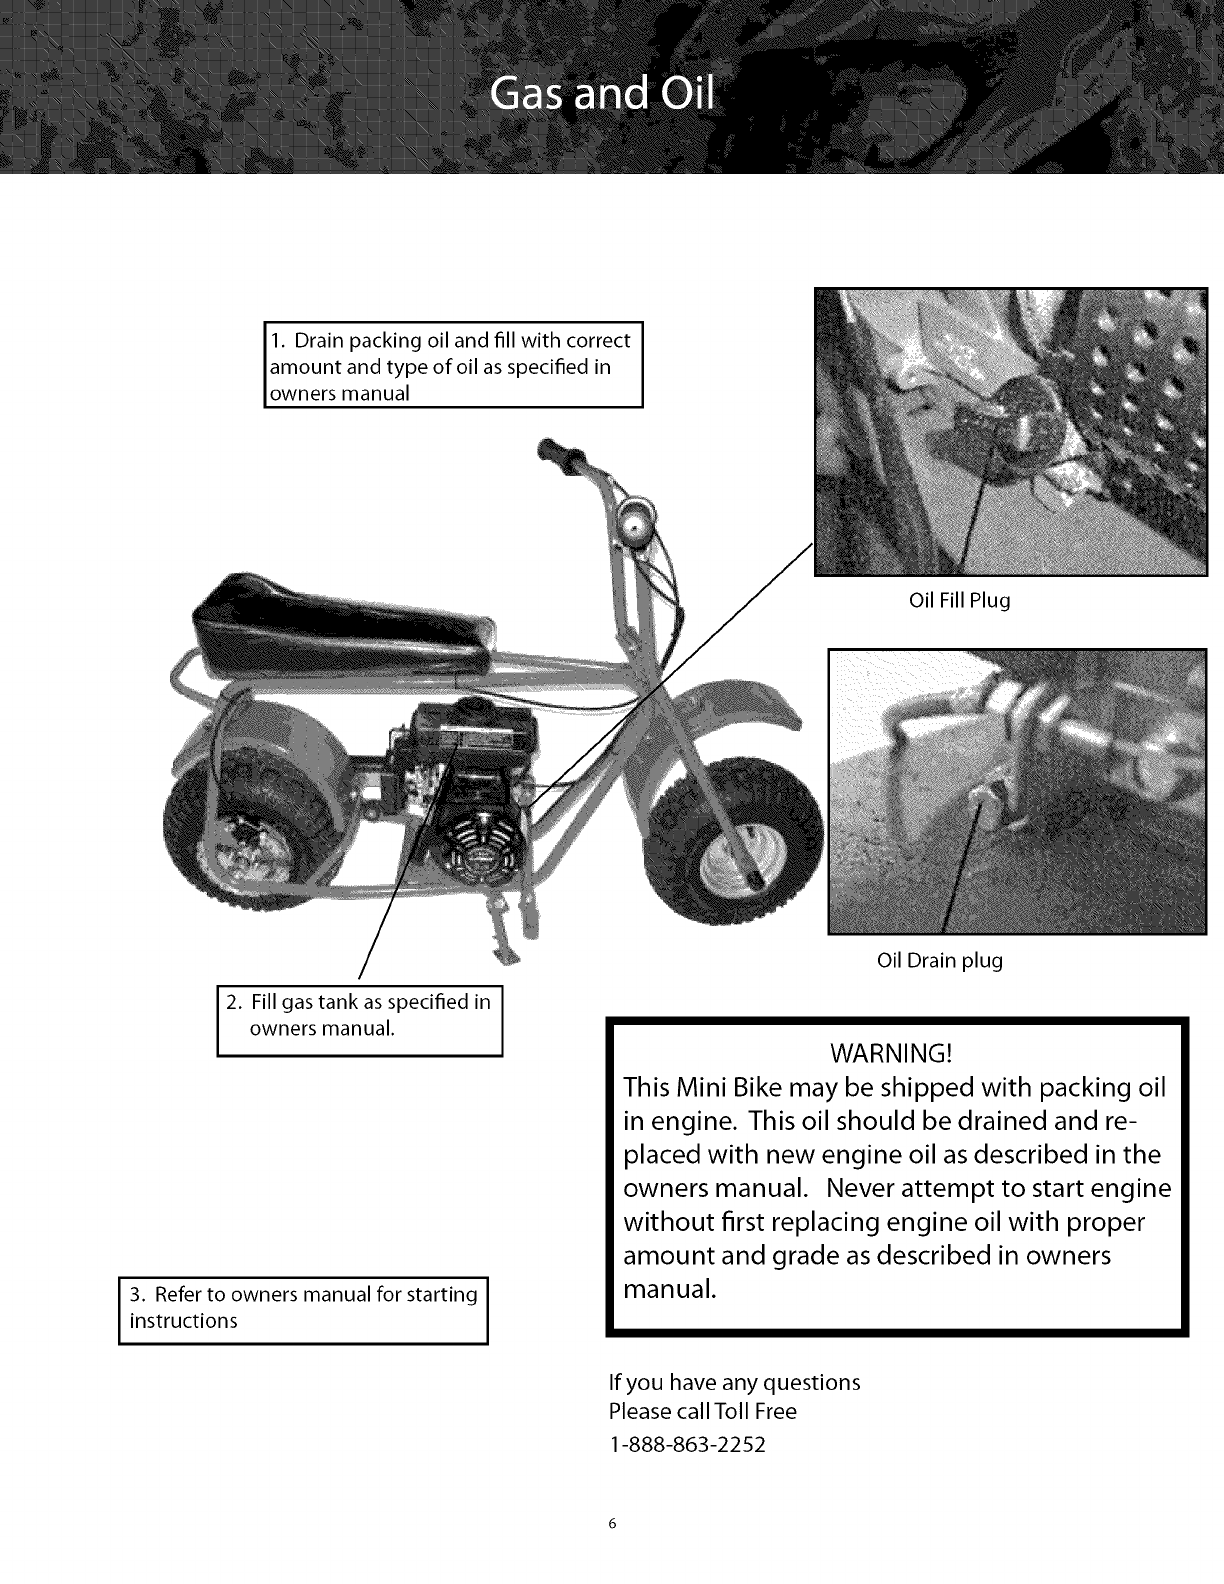 [SCHEMATICS_49CH]  Baja DB30 User Manual DOODLE BUG MINI BIKE Manuals And Guides L0912190 | 97cc Engine Diagram |  | UserManual.wiki